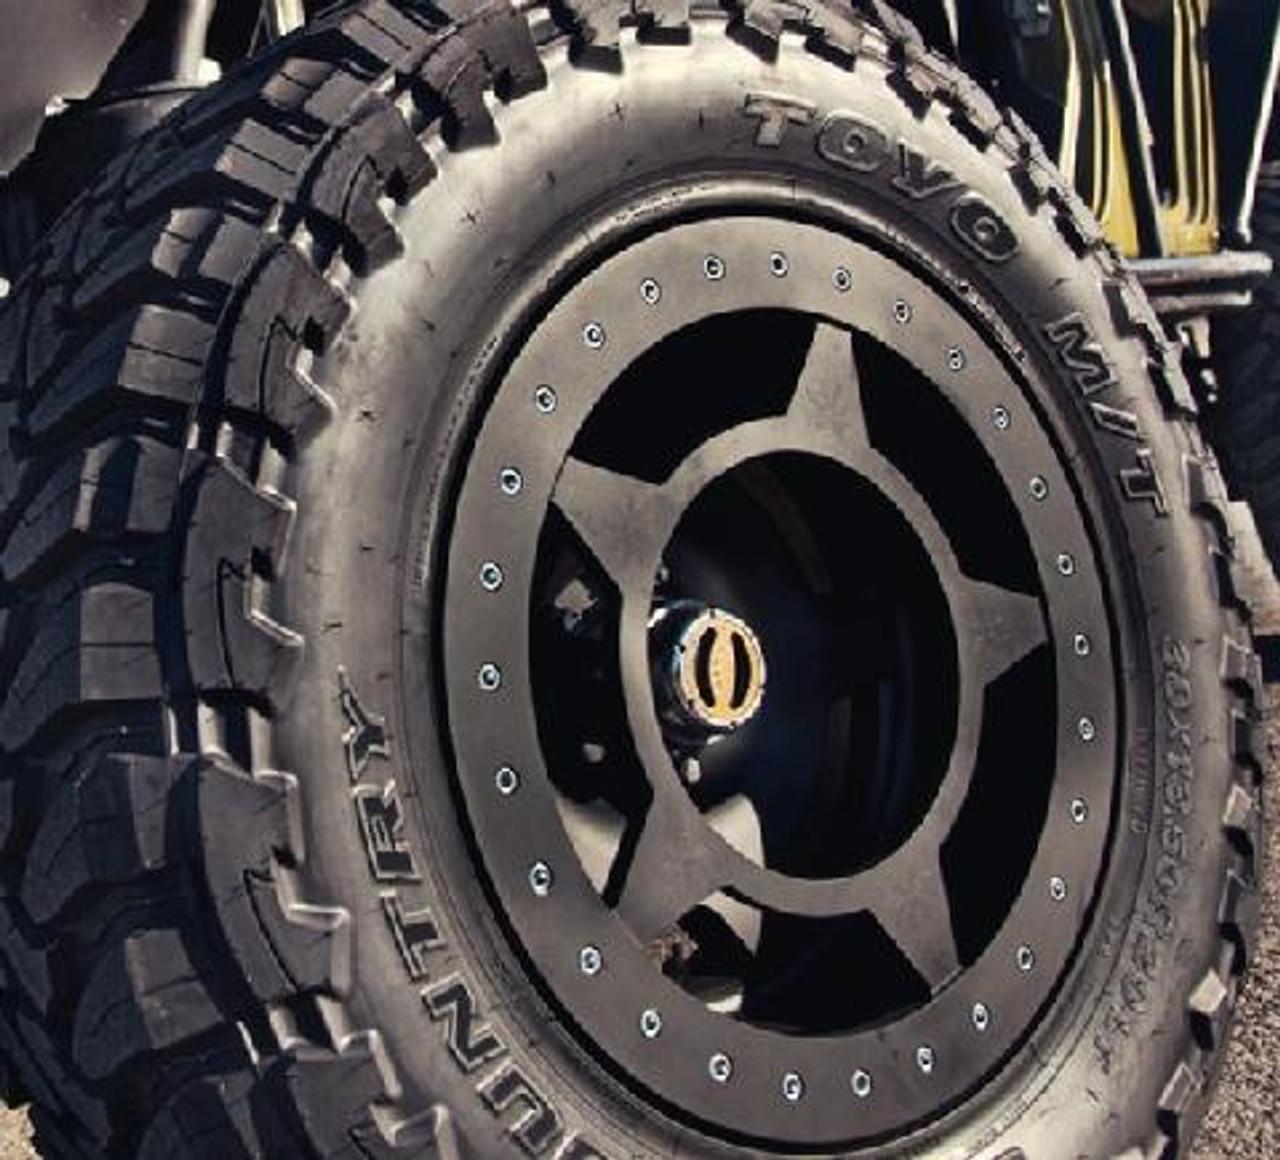 "Close Up of Spyderlock Wheel 17x9.5"" Wheel Mounted"